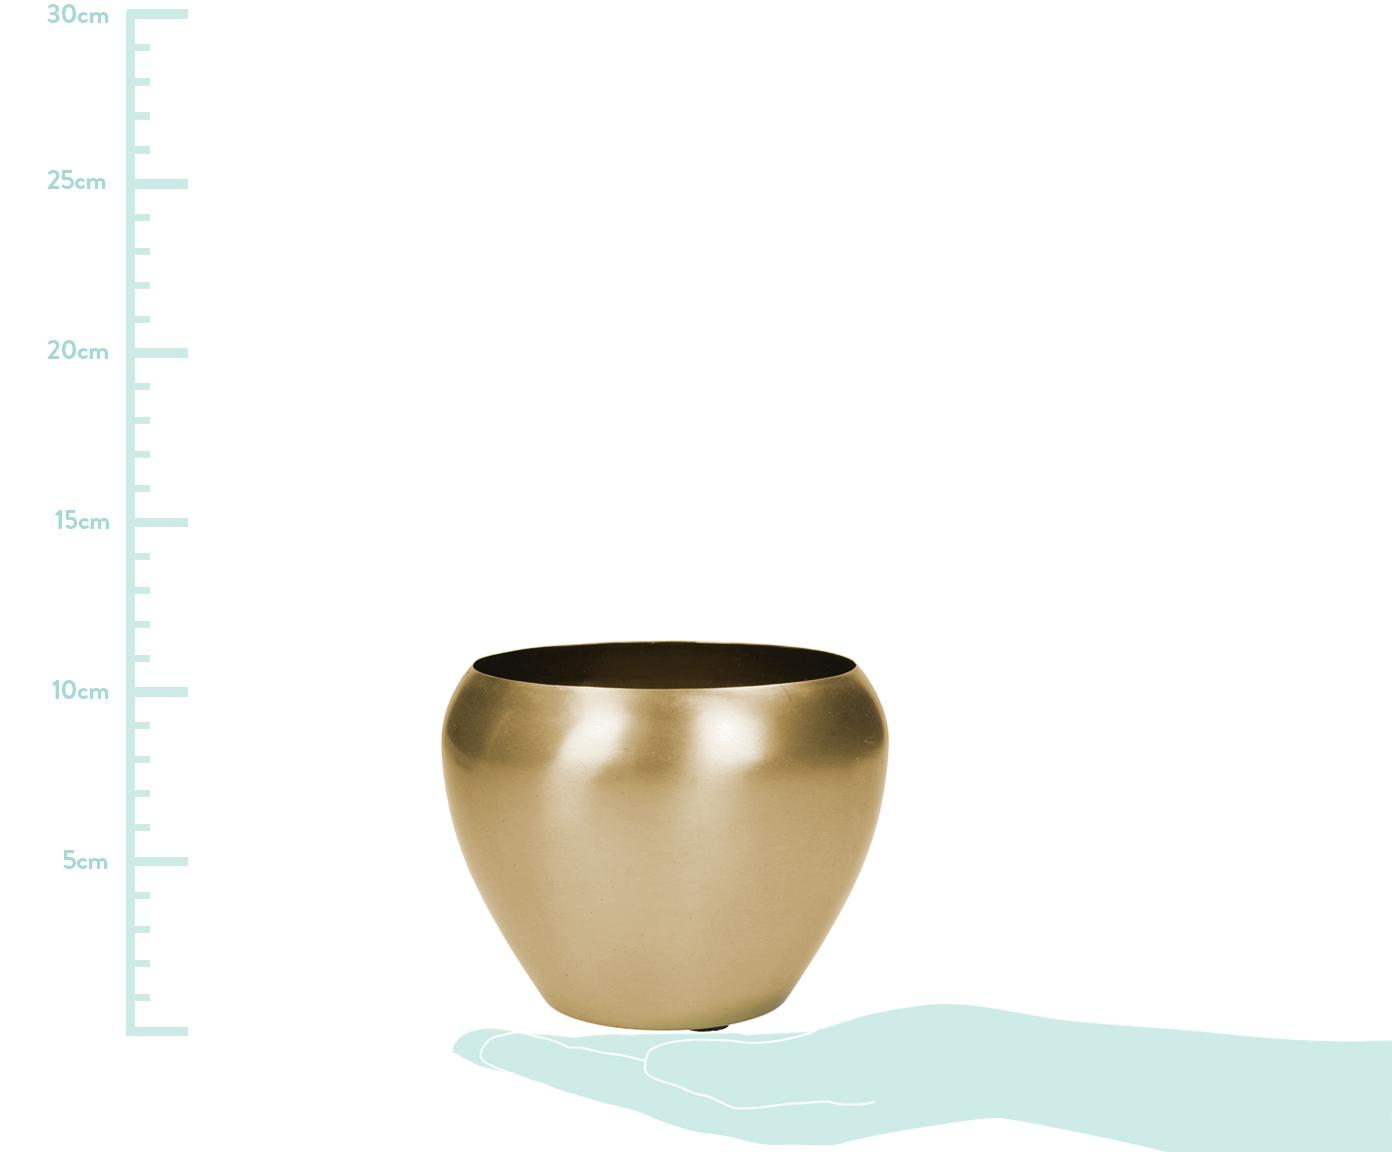 Portavaso Pat, Metallo rivestito, Ottonato, Ø 12 x Alt. 10 cm